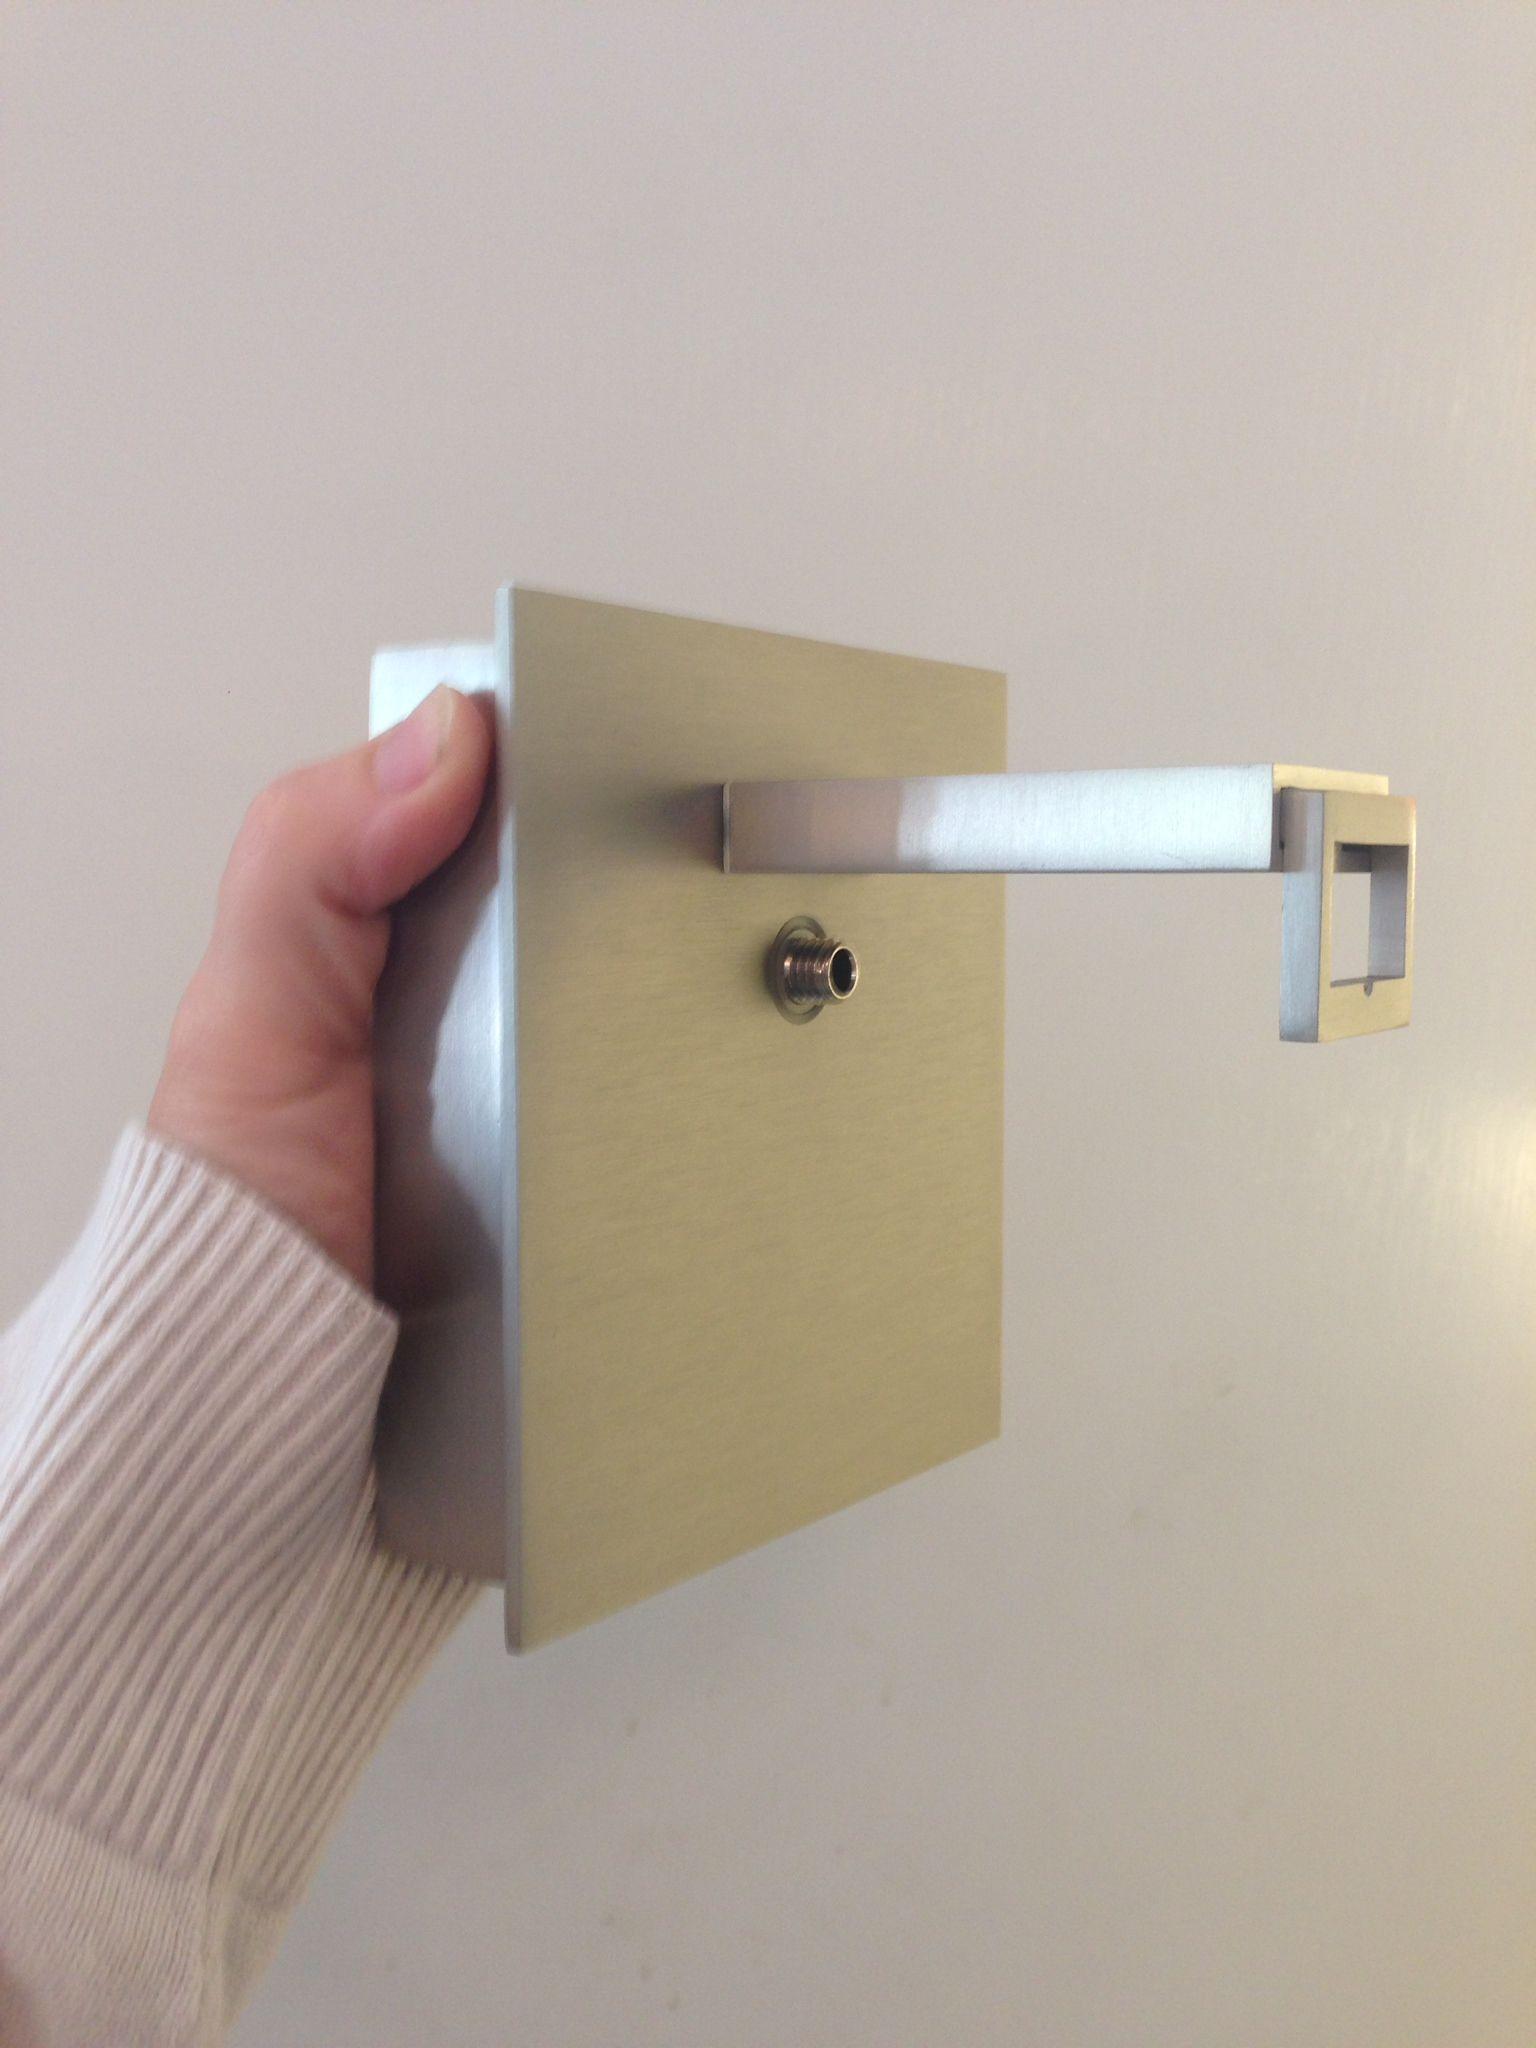 Pin By Lunaria Inc On Vendor Lbl Lighting Lbl Lighting Door Handles Home Decor